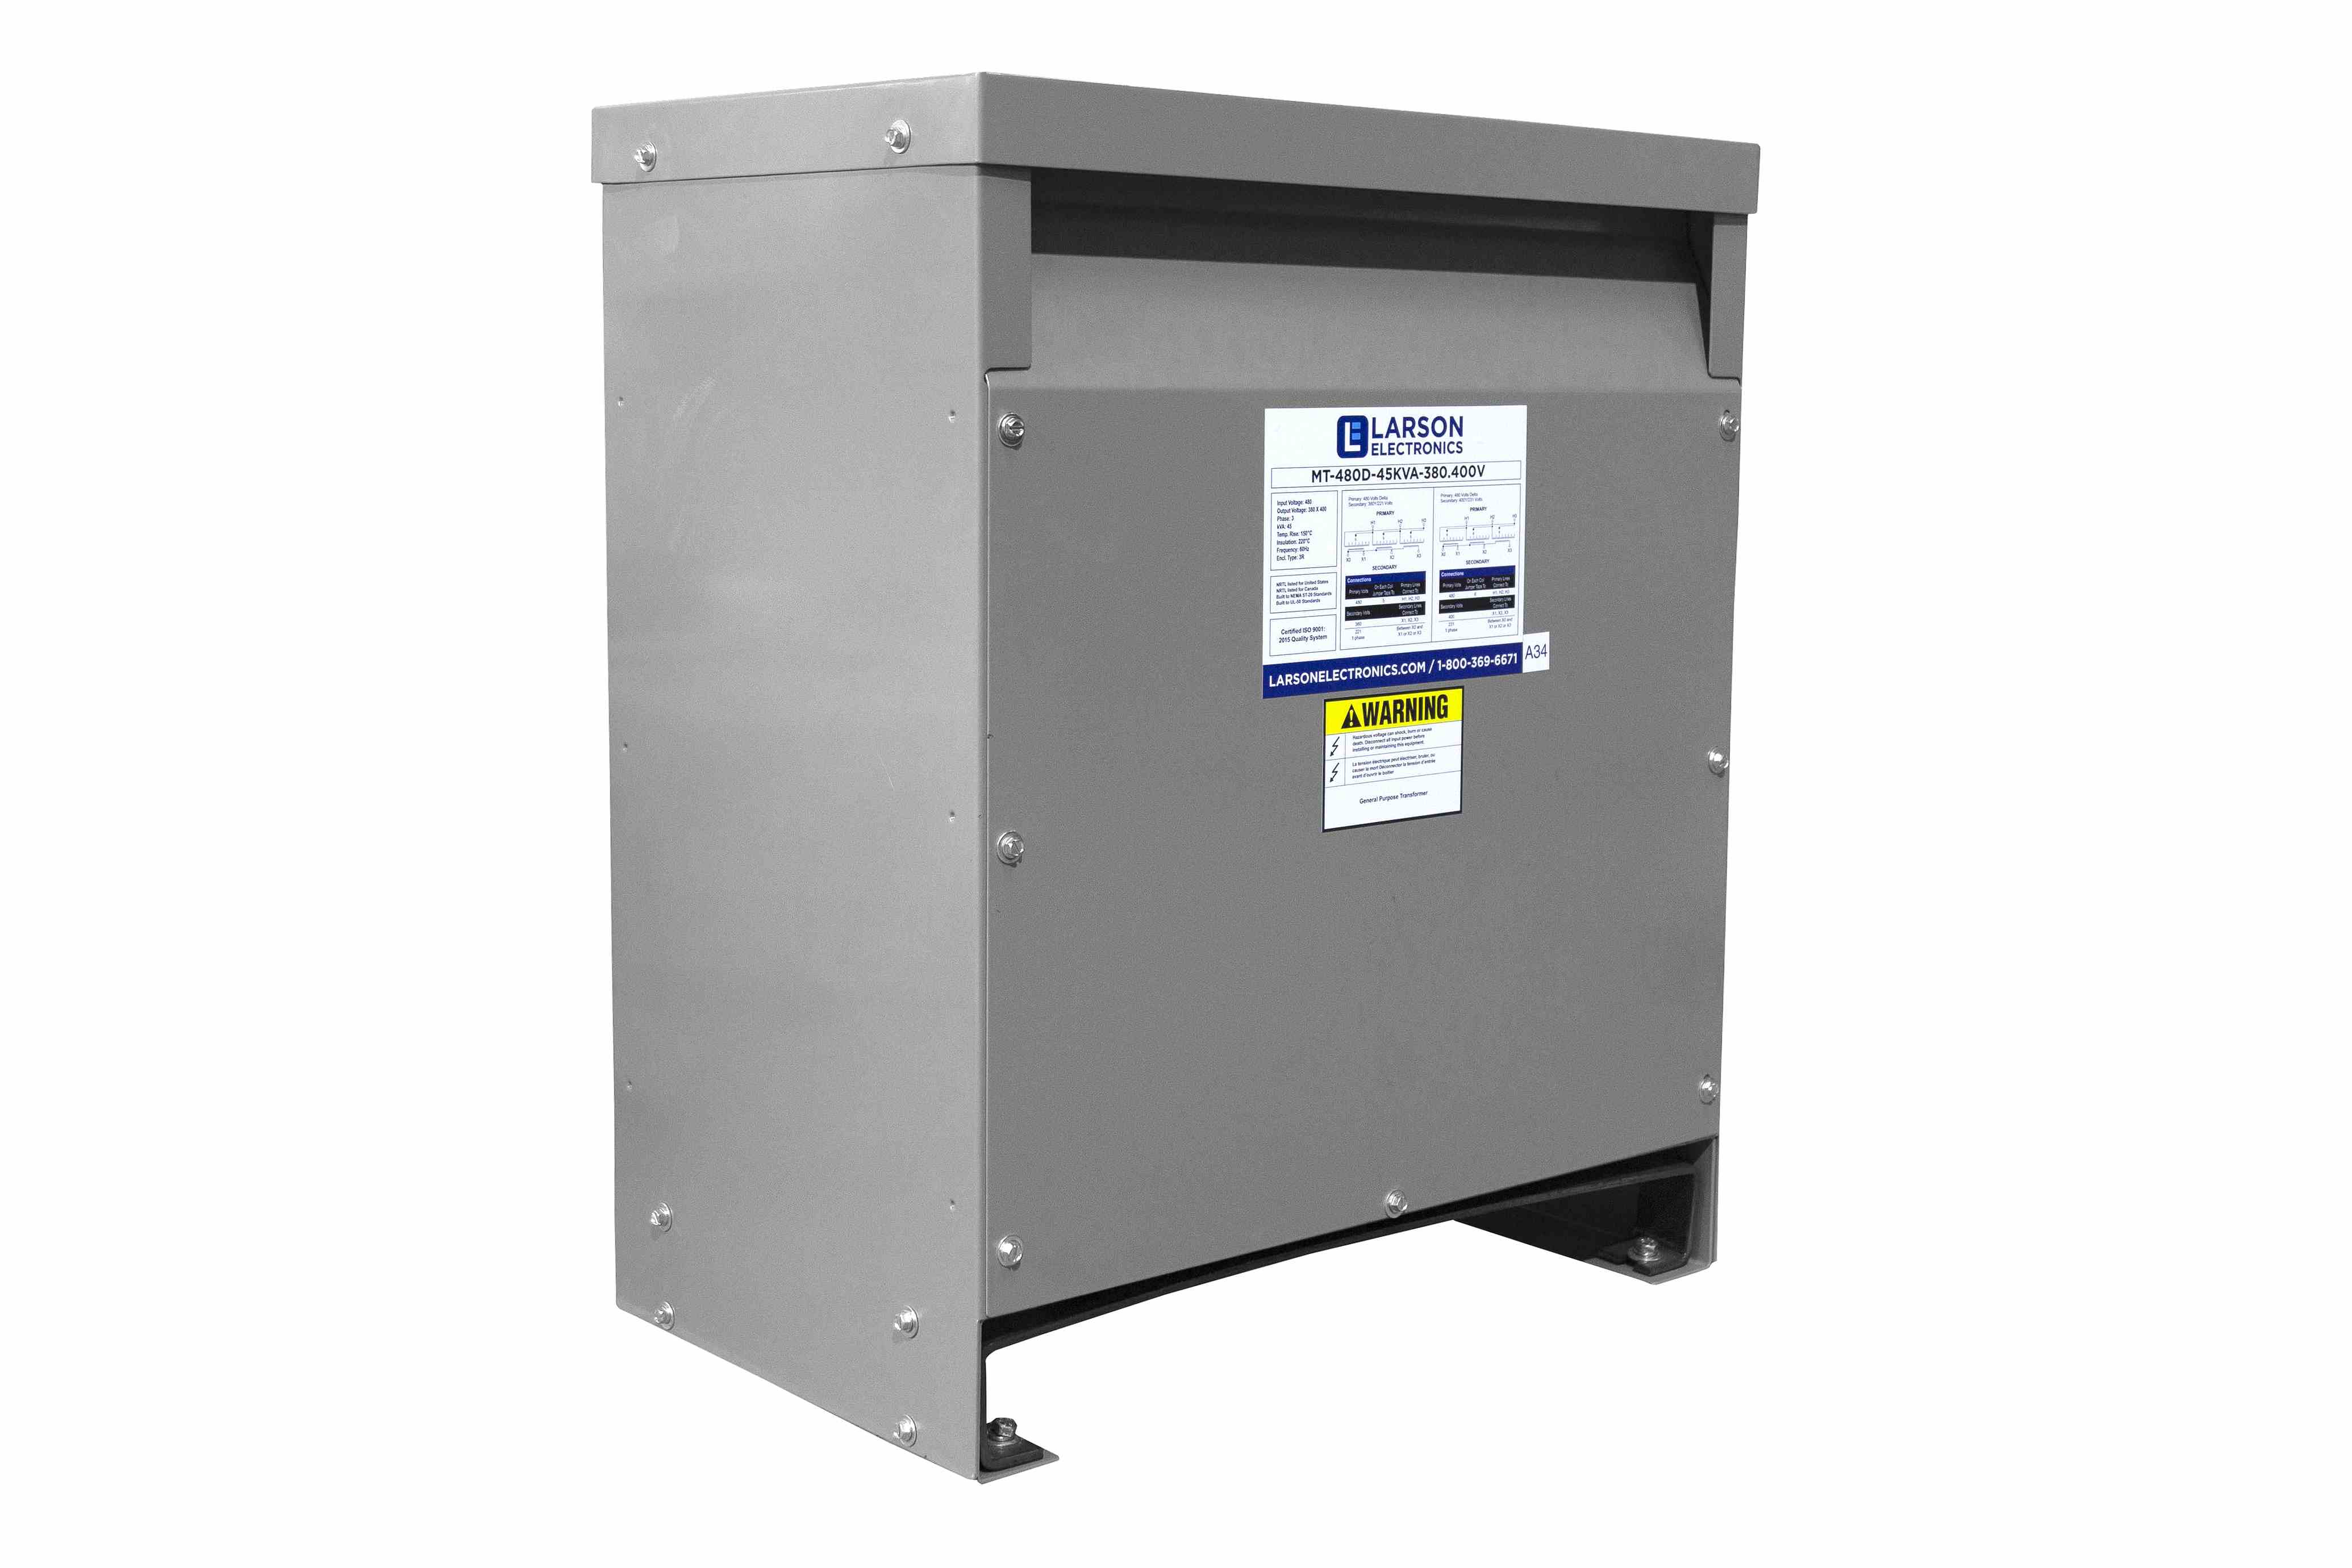 50 kVA 3PH Isolation Transformer, 480V Wye Primary, 208Y/120 Wye-N Secondary, N3R, Ventilated, 60 Hz